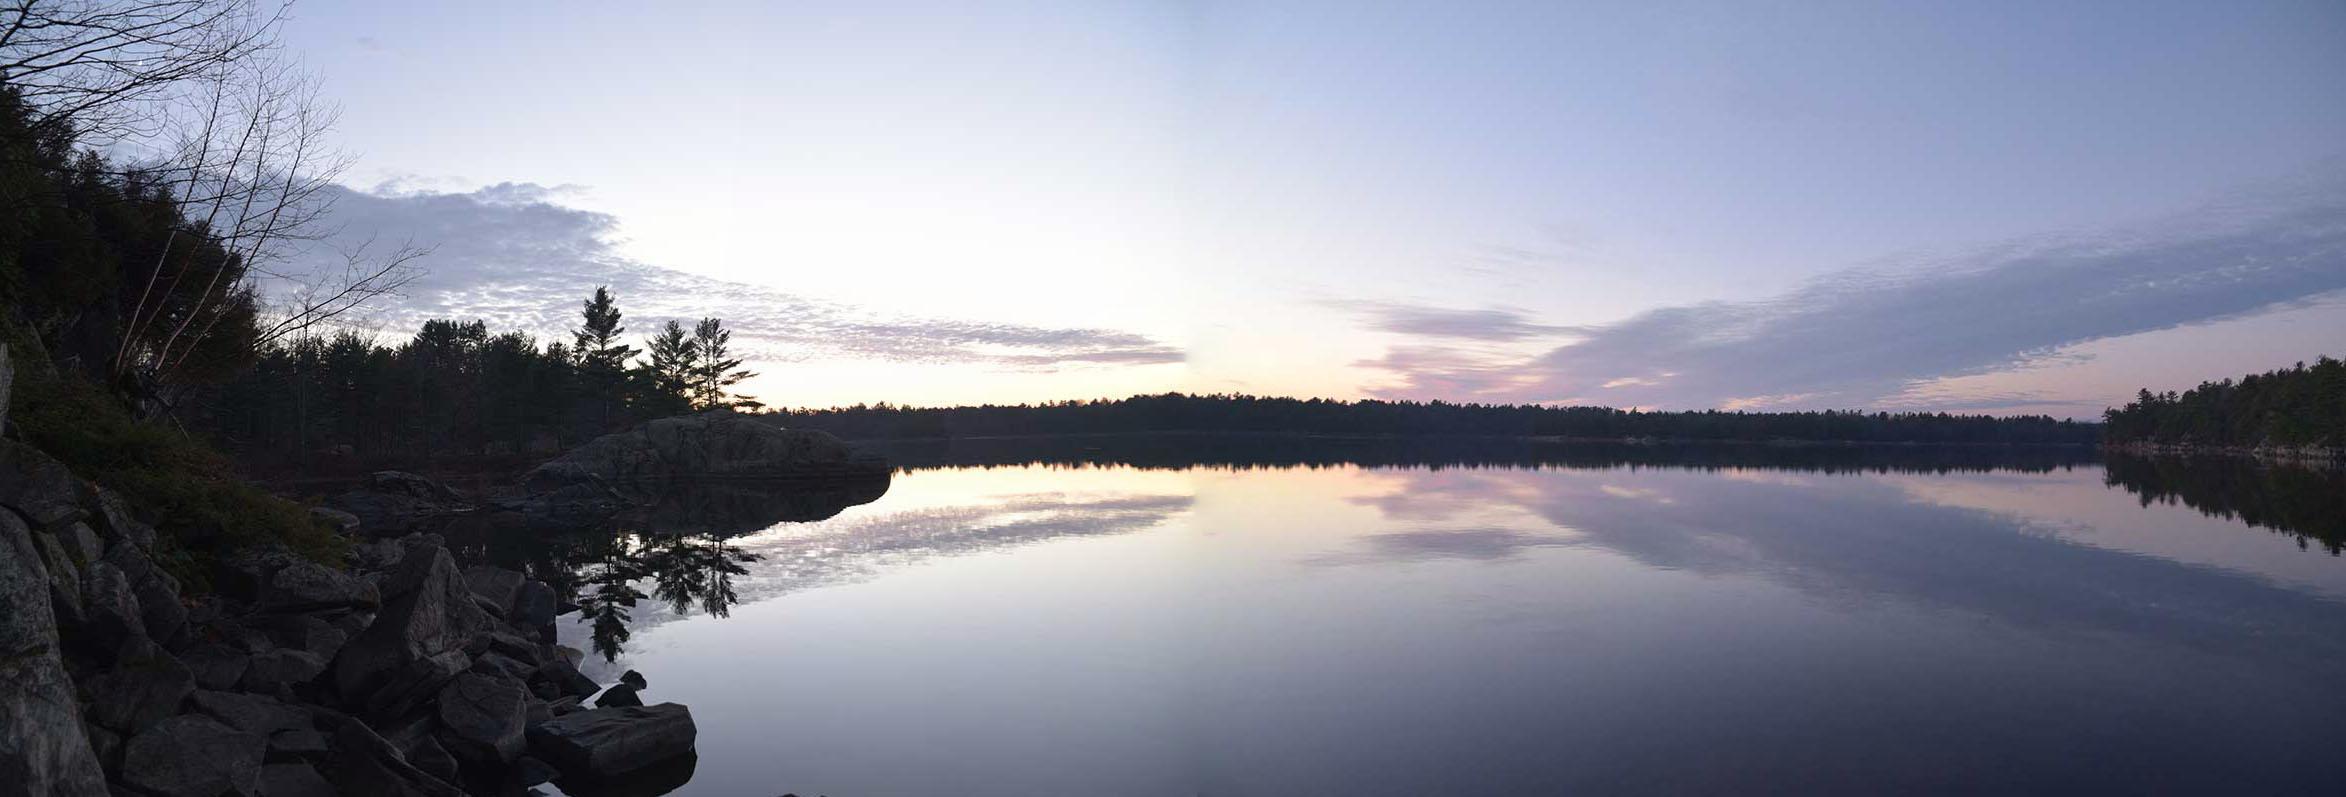 McCrae-Lake-Nov-2015_panorama.jpg